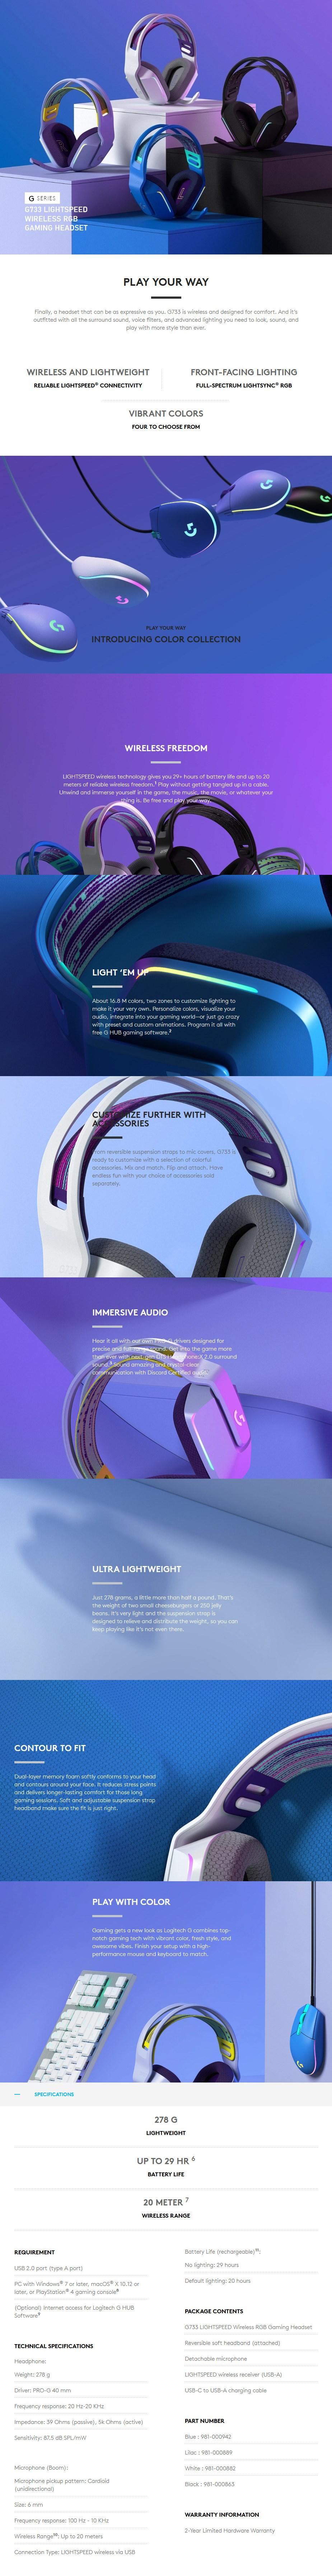 G733 LIGHTSPEED Wireless RGB Gaming Headset - Overview 1